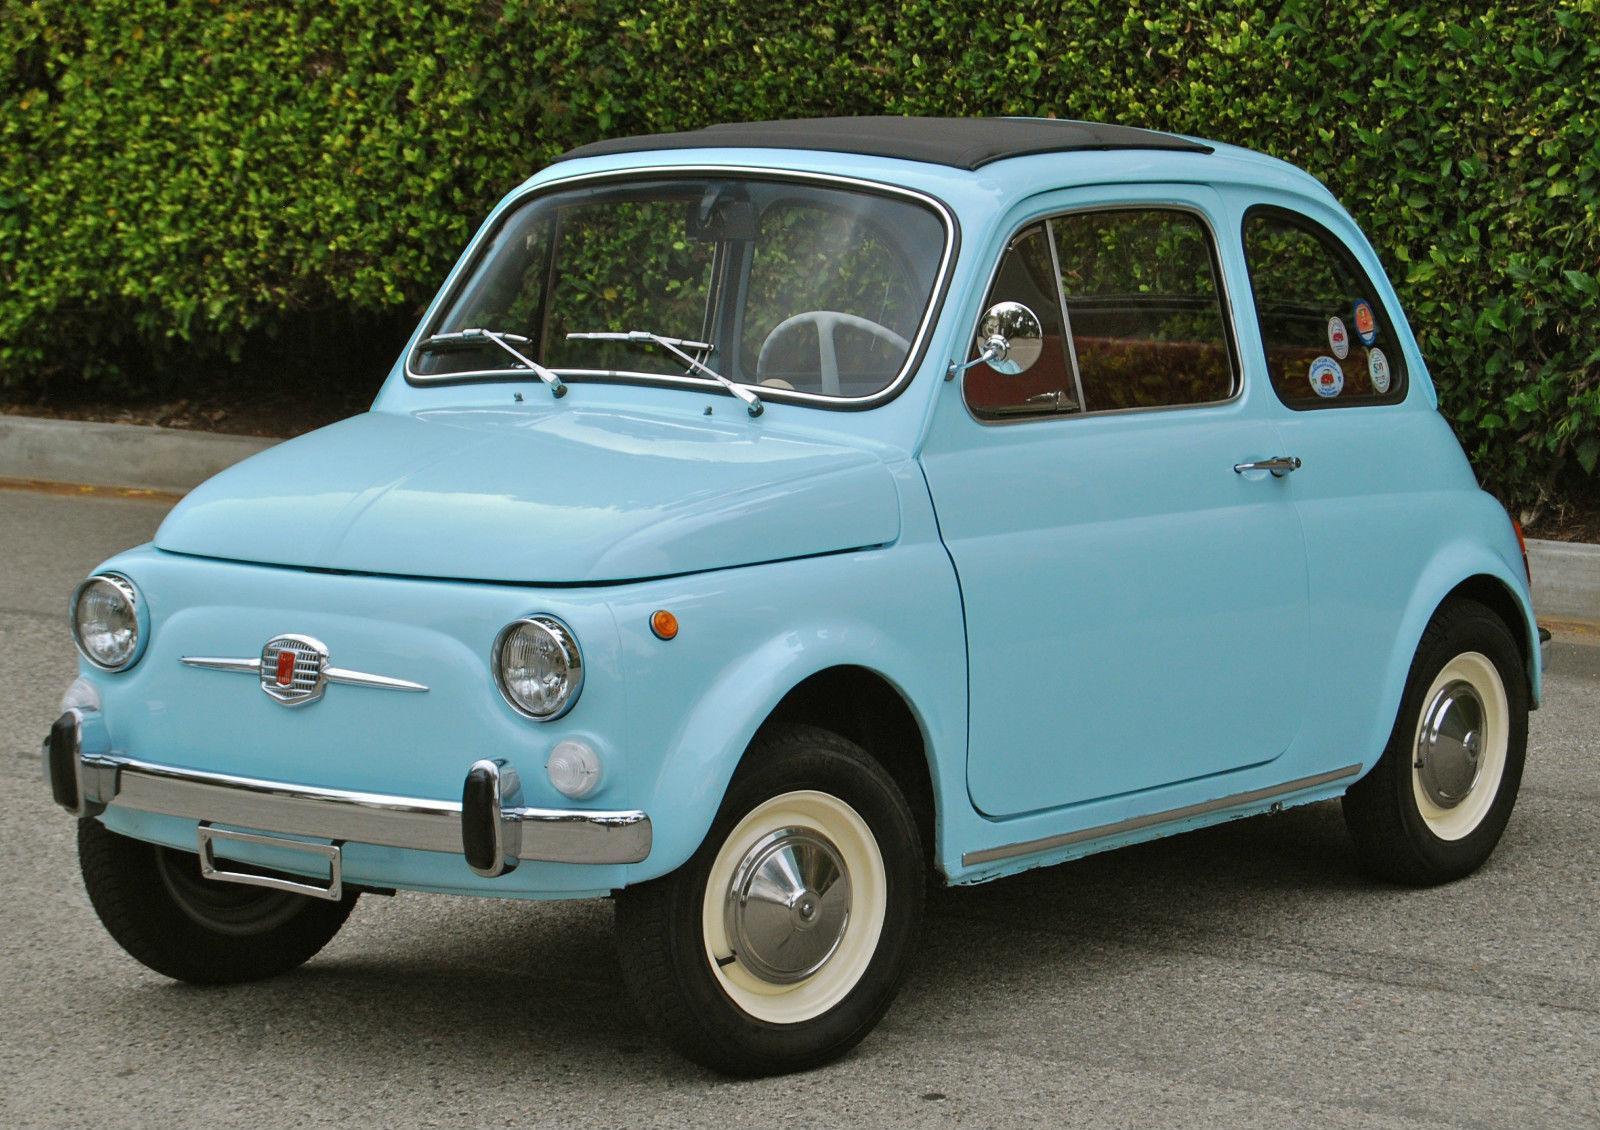 Fiat Fully Restored Italian Cars For Sale